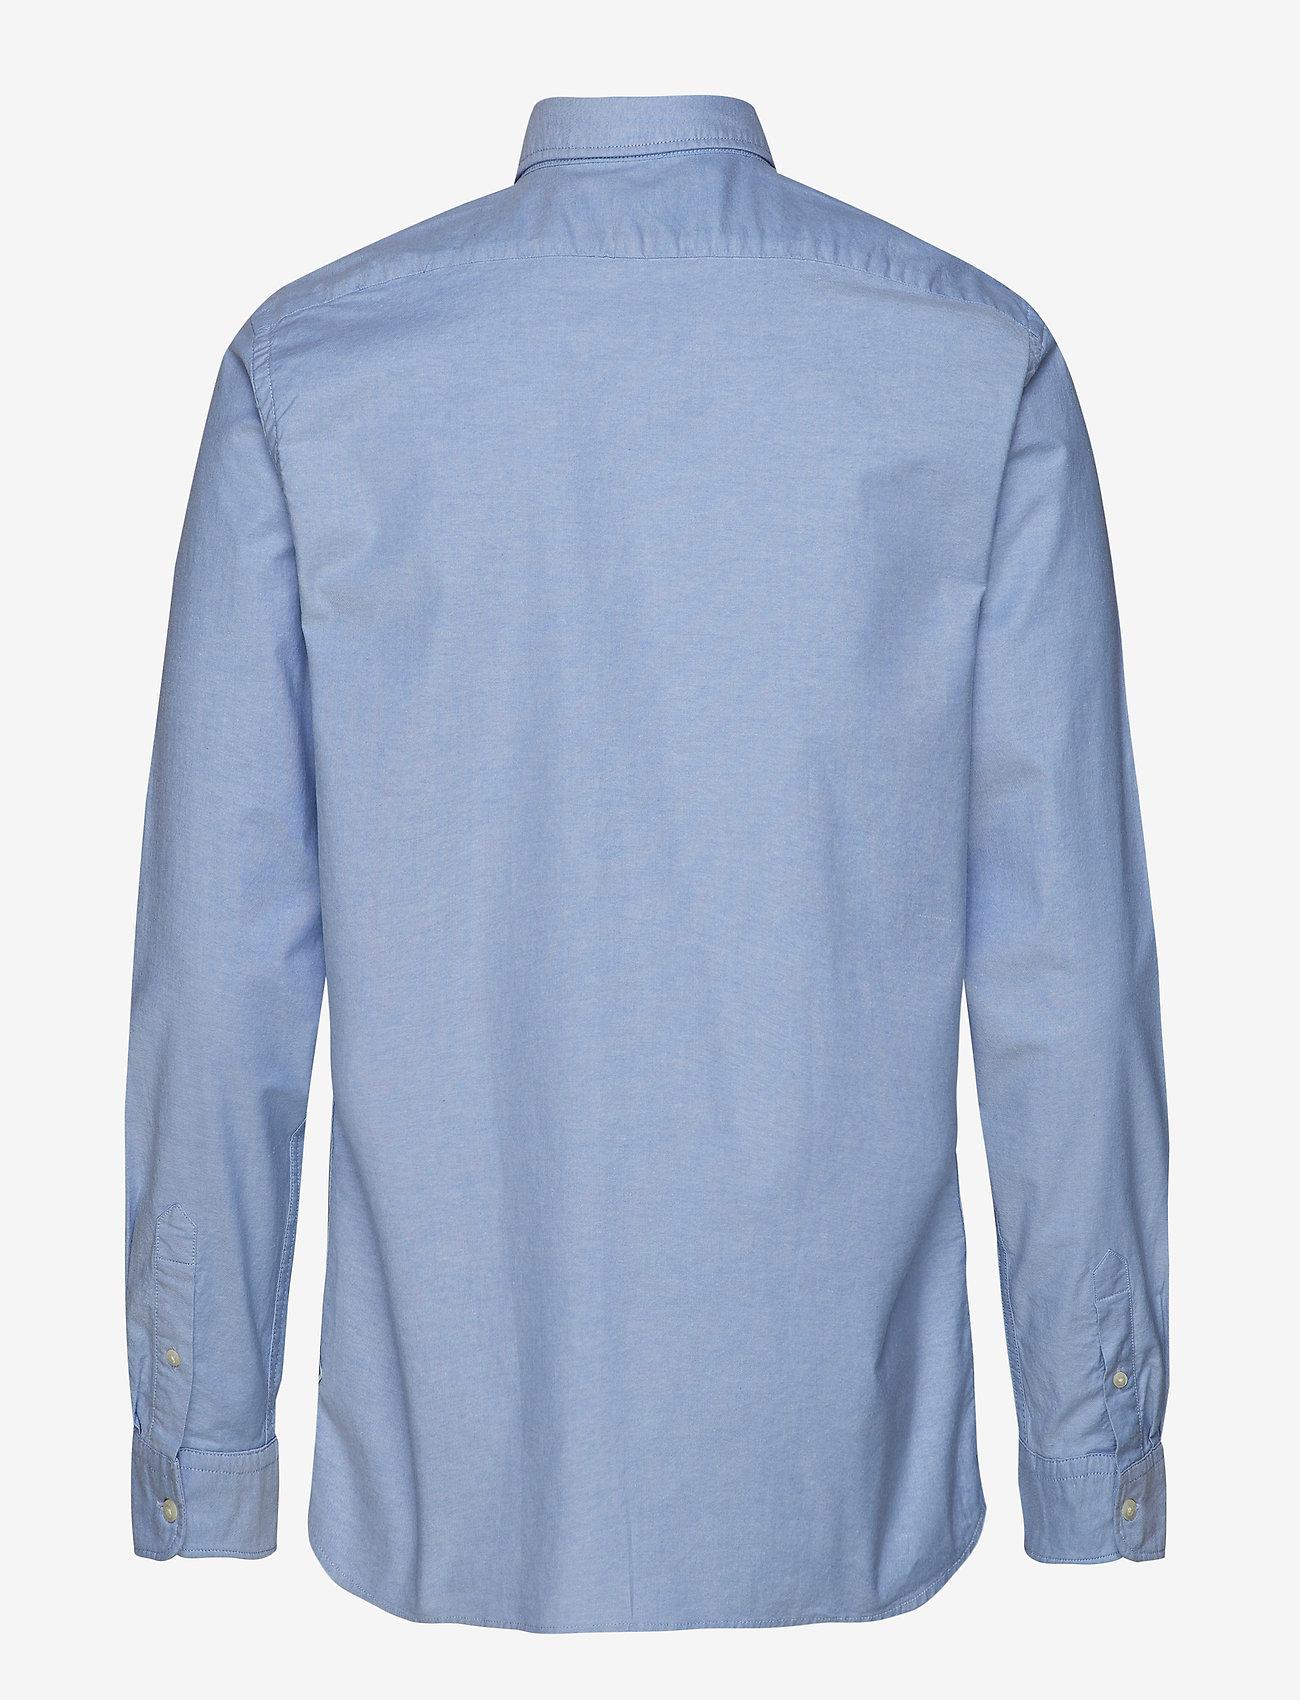 Scotch & Soda - NOS Oxford shirt regular fit button down collar - chemises basiques - blue - 1